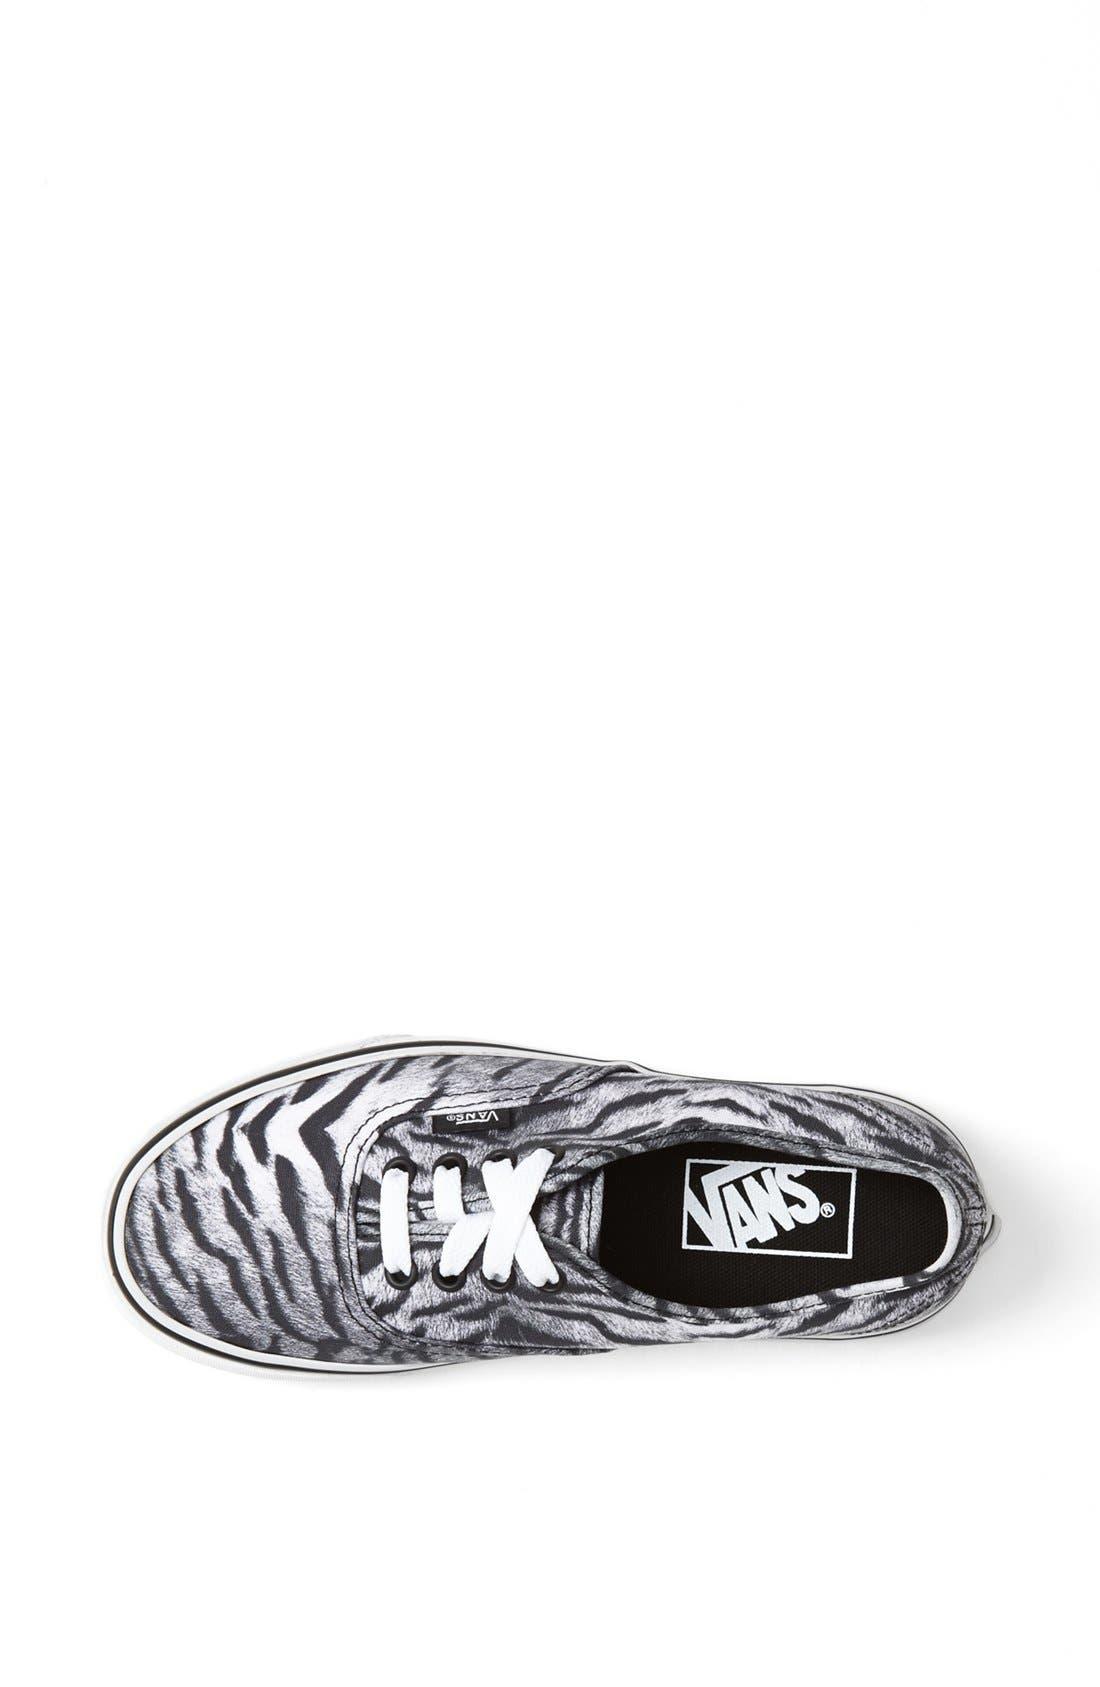 Alternate Image 3  - Vans 'Authentic' Sneaker (Women)